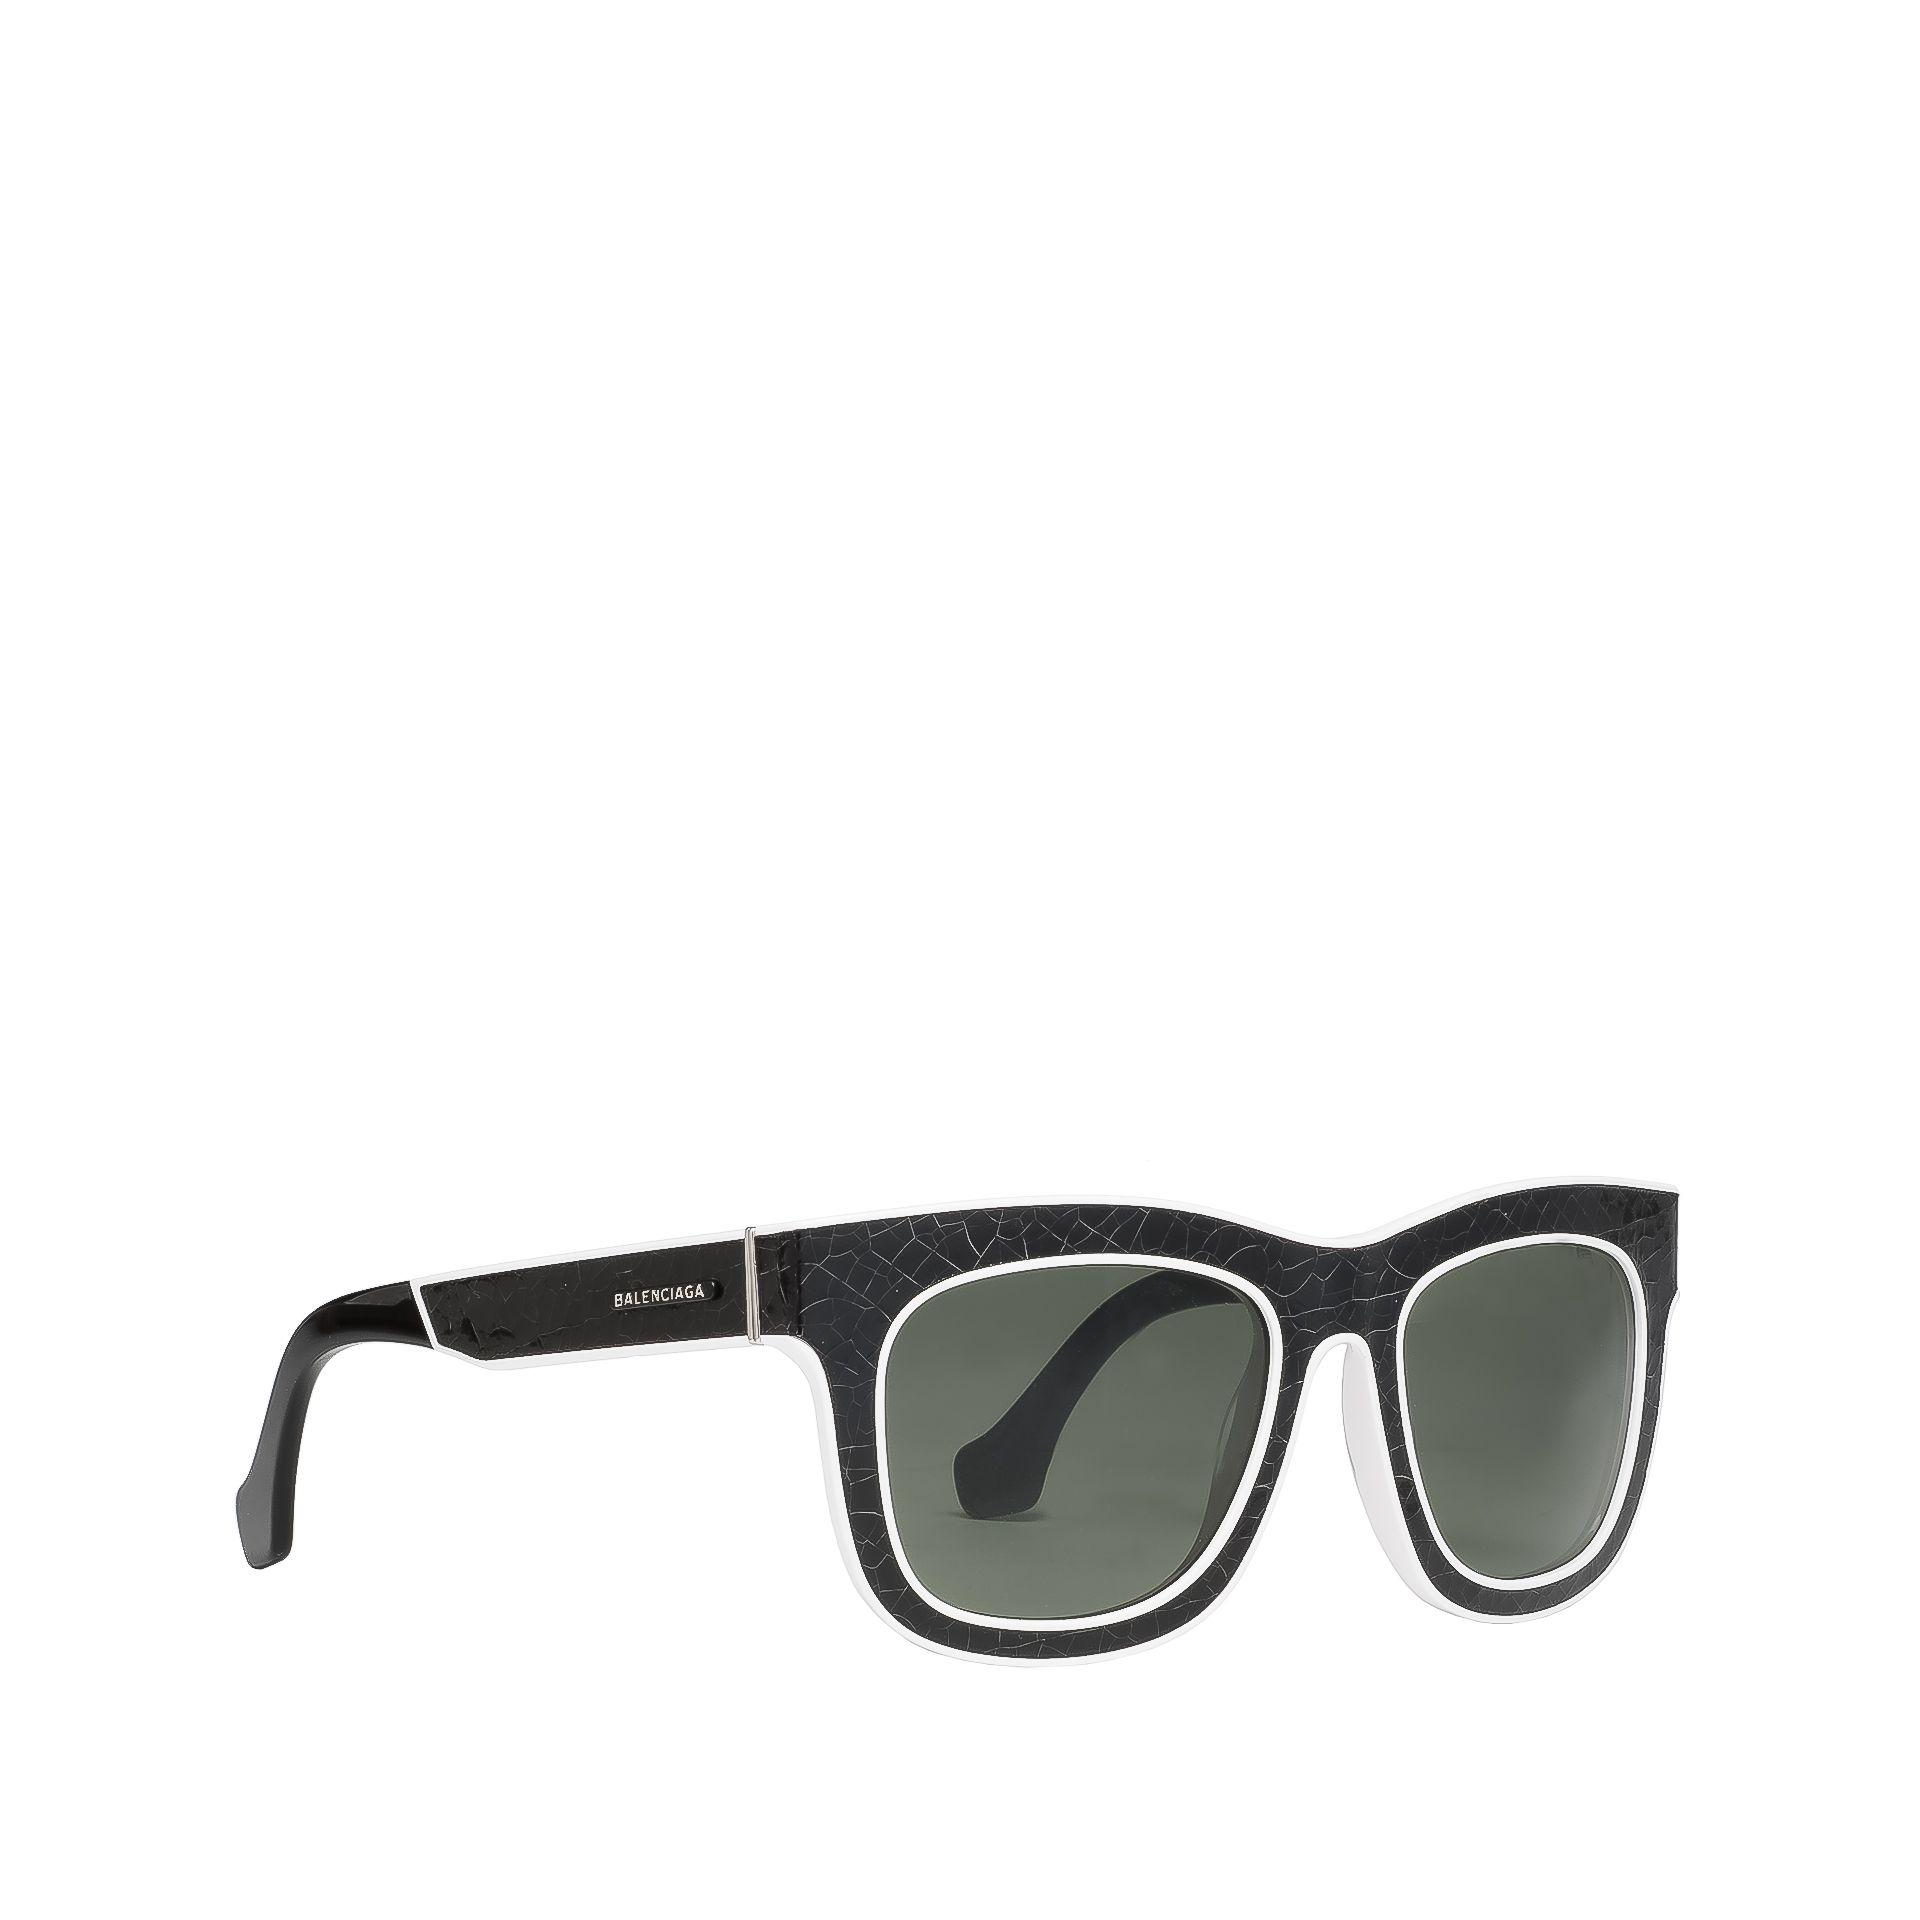 Balenciaga Marble Sunglasses